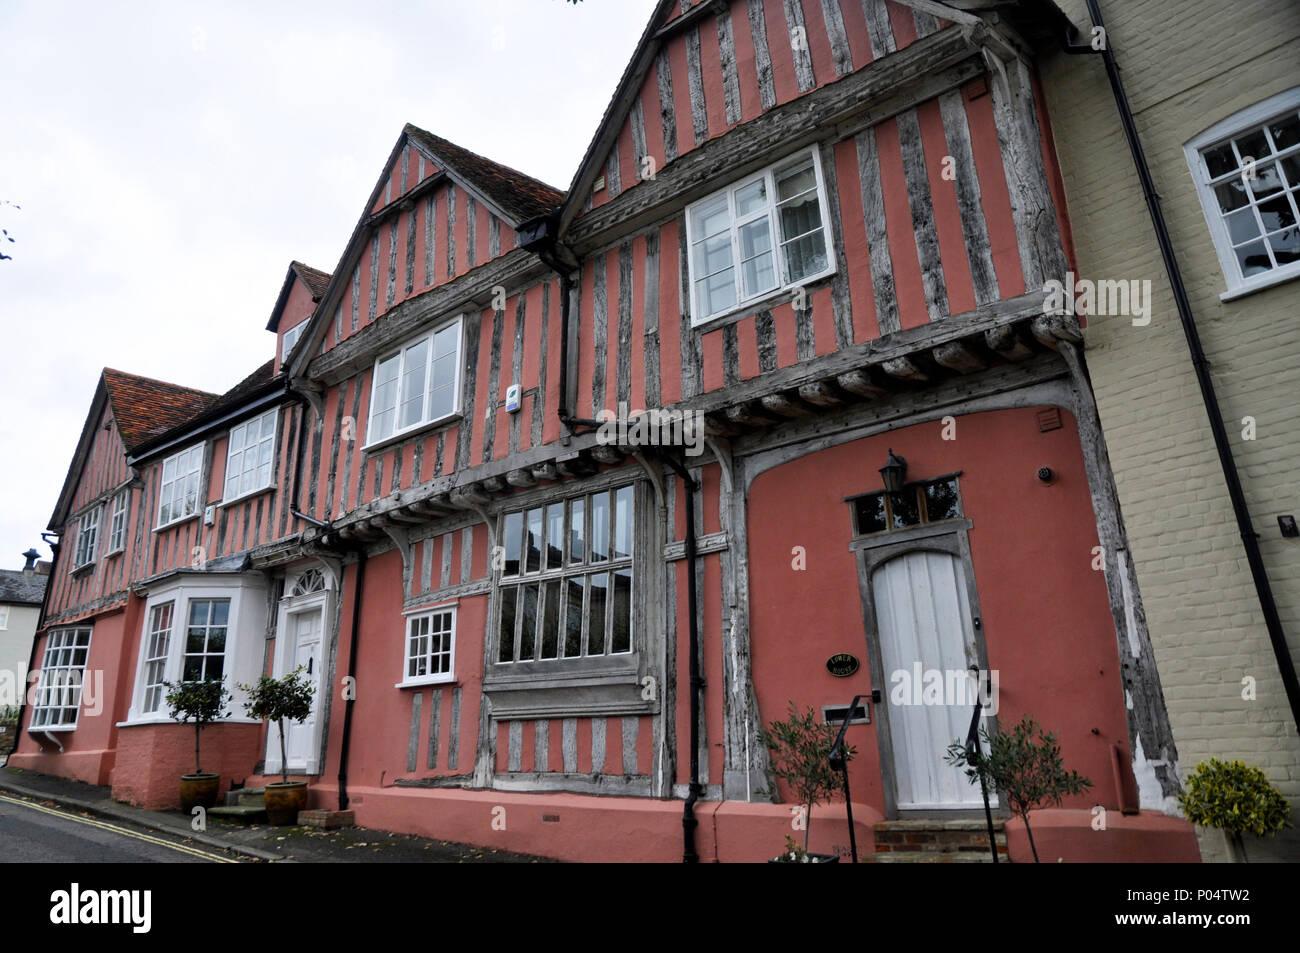 lower house lavenham suffolk - Stock Image